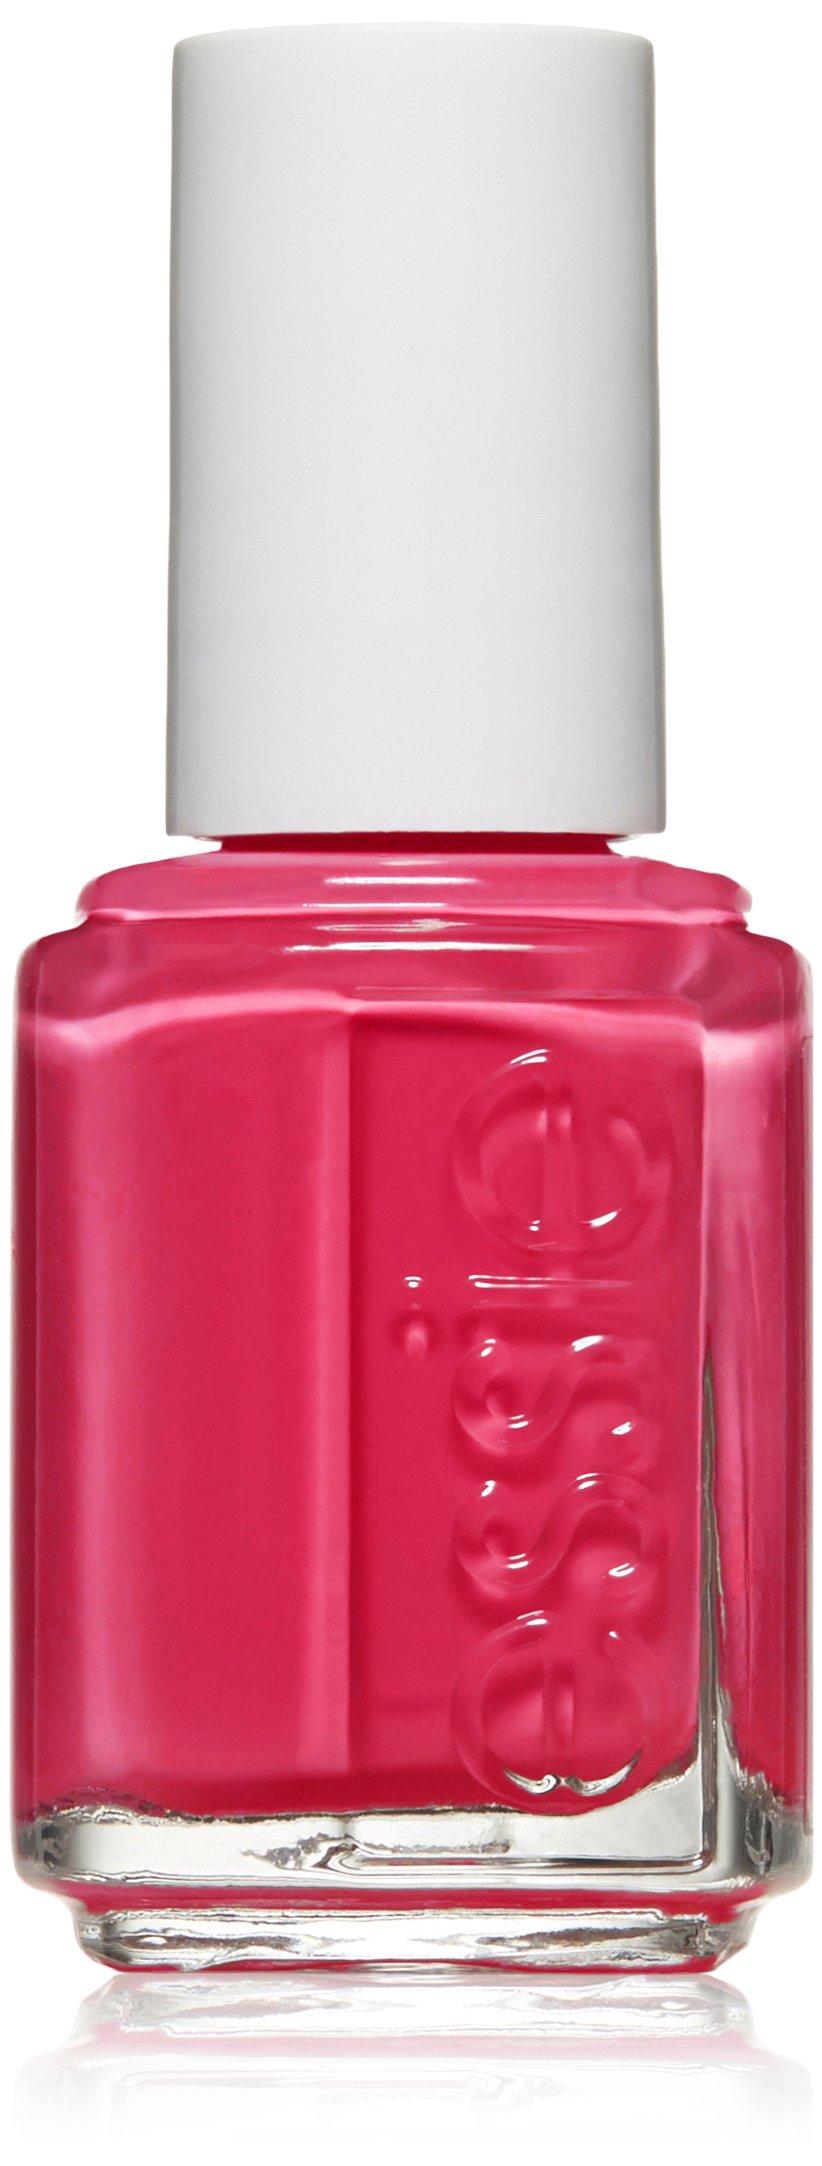 Amazon.com : essie nail polish, secret story, bright fuchsia pink ...